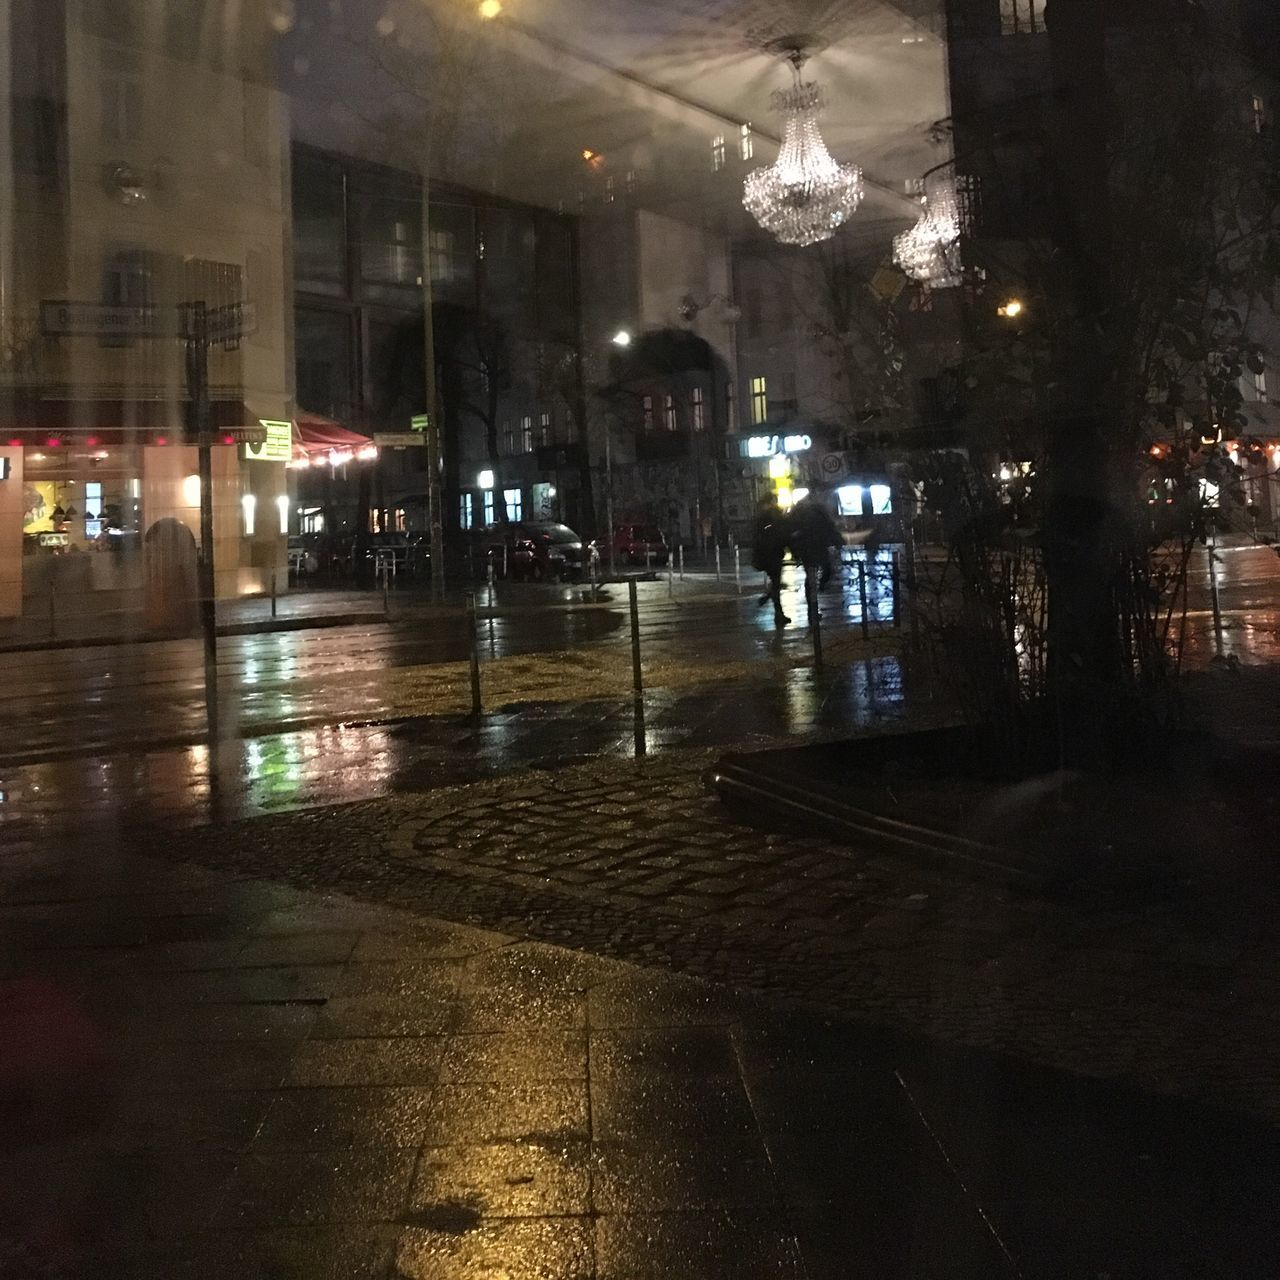 Nasse Straße mit Kronleuchter Berlin Reflection Artificial Light Rain Rainy Evening Rainy Street Light And Darkness  light and reflection Outside Crossroads Intimes